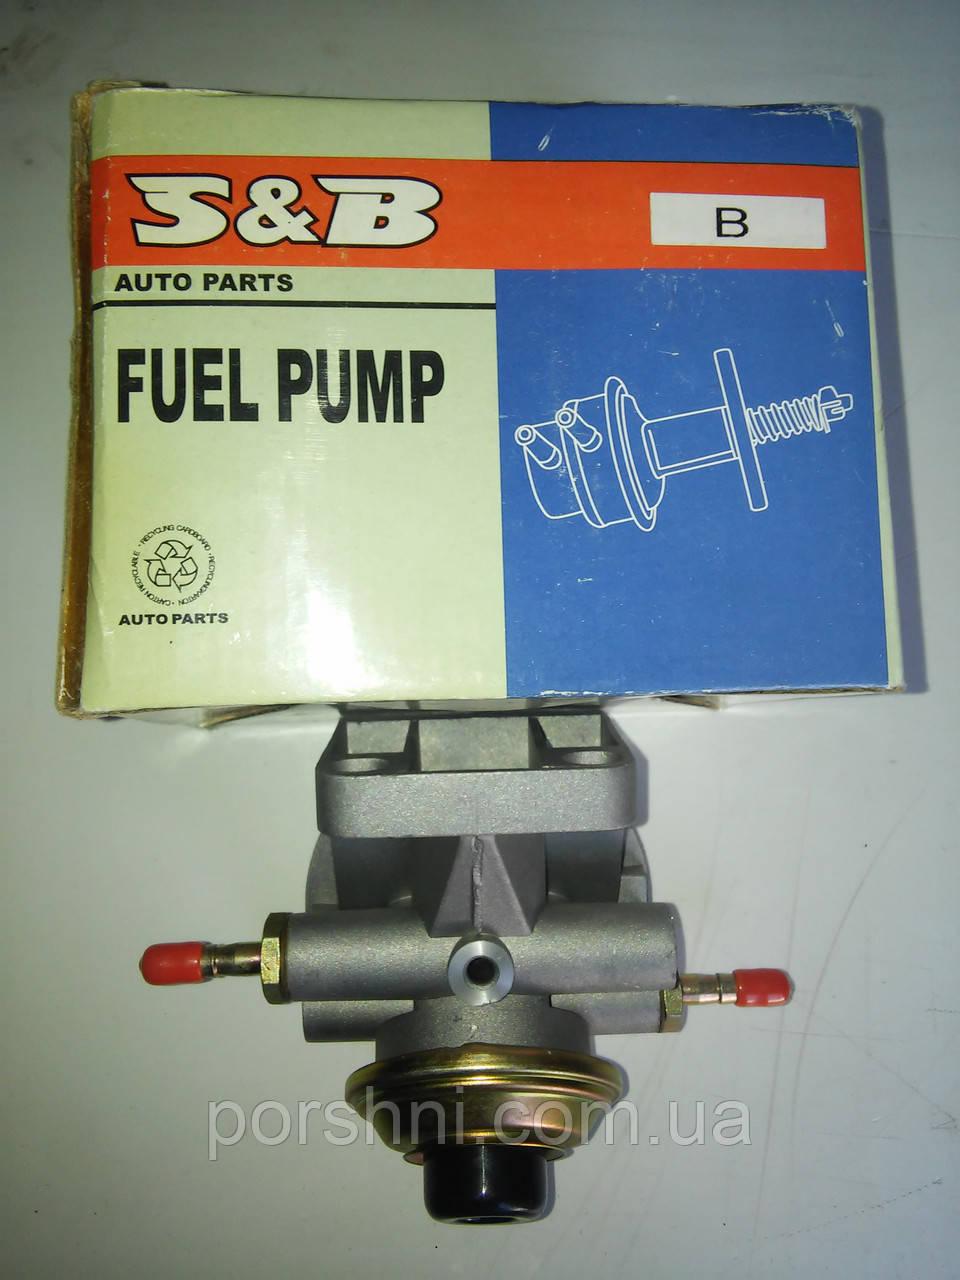 Подкачка топлива Ford  Sierra Scorpio 2.3-2.5 дизель.